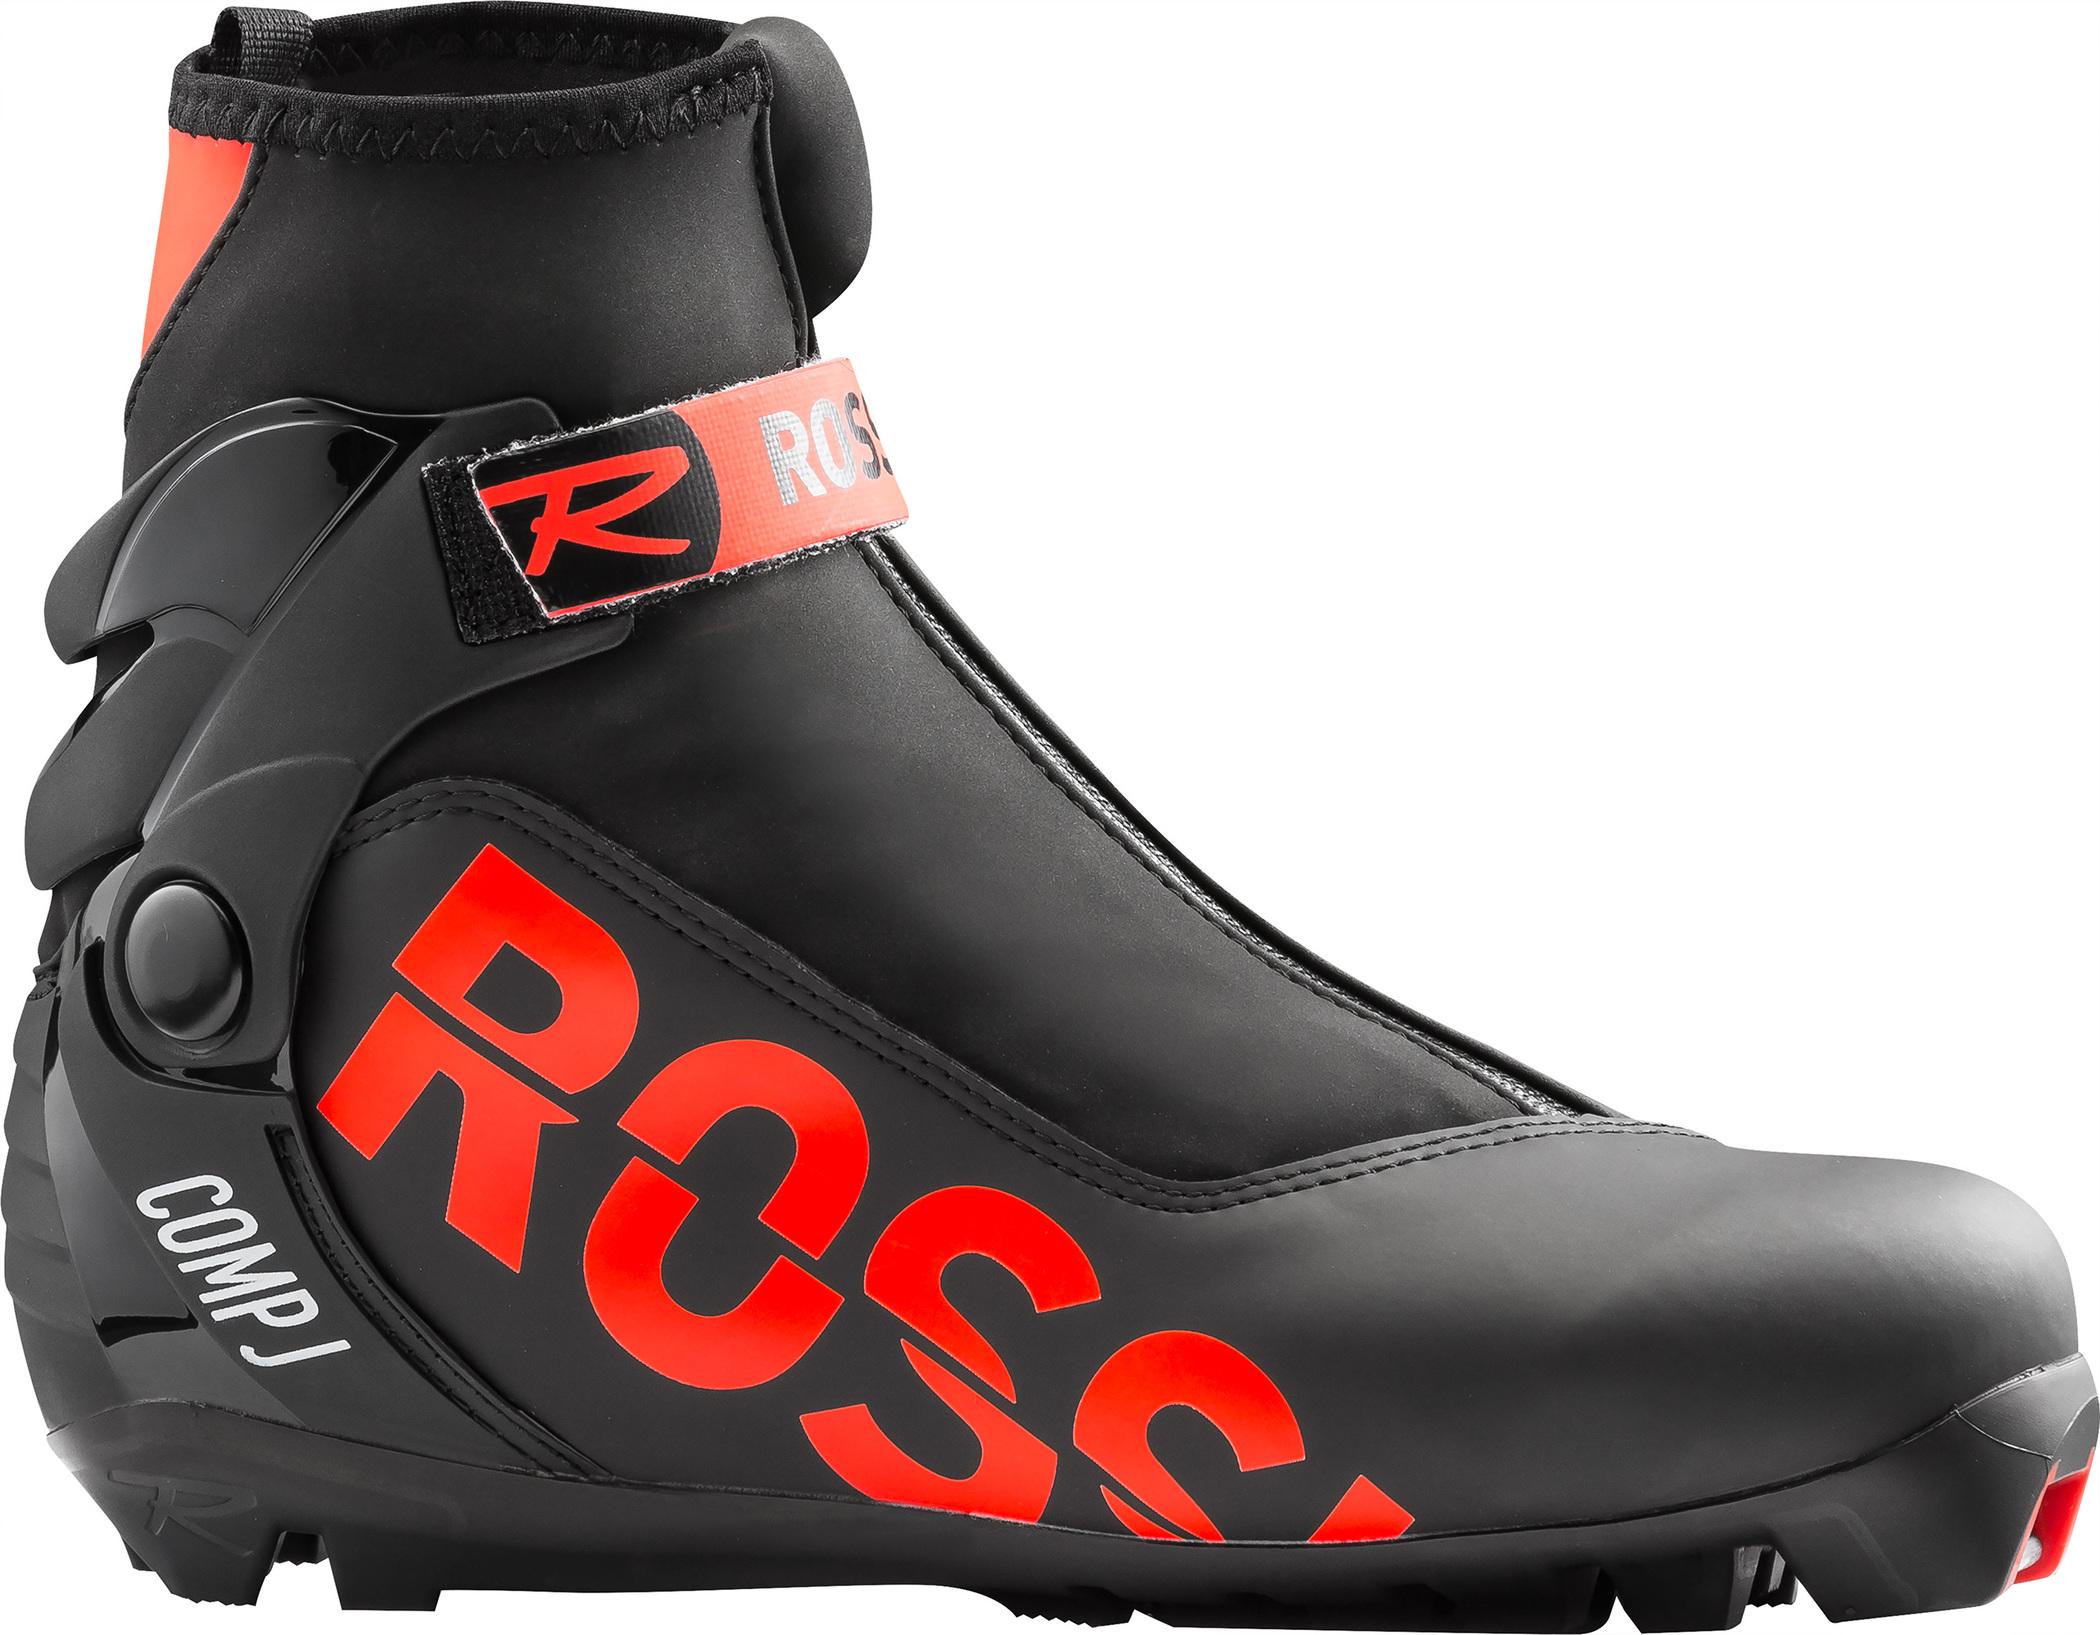 Dětské boty na běžky Rossignol Comp J - Ski a Bike Centrum Radotín 9c1de29dbc